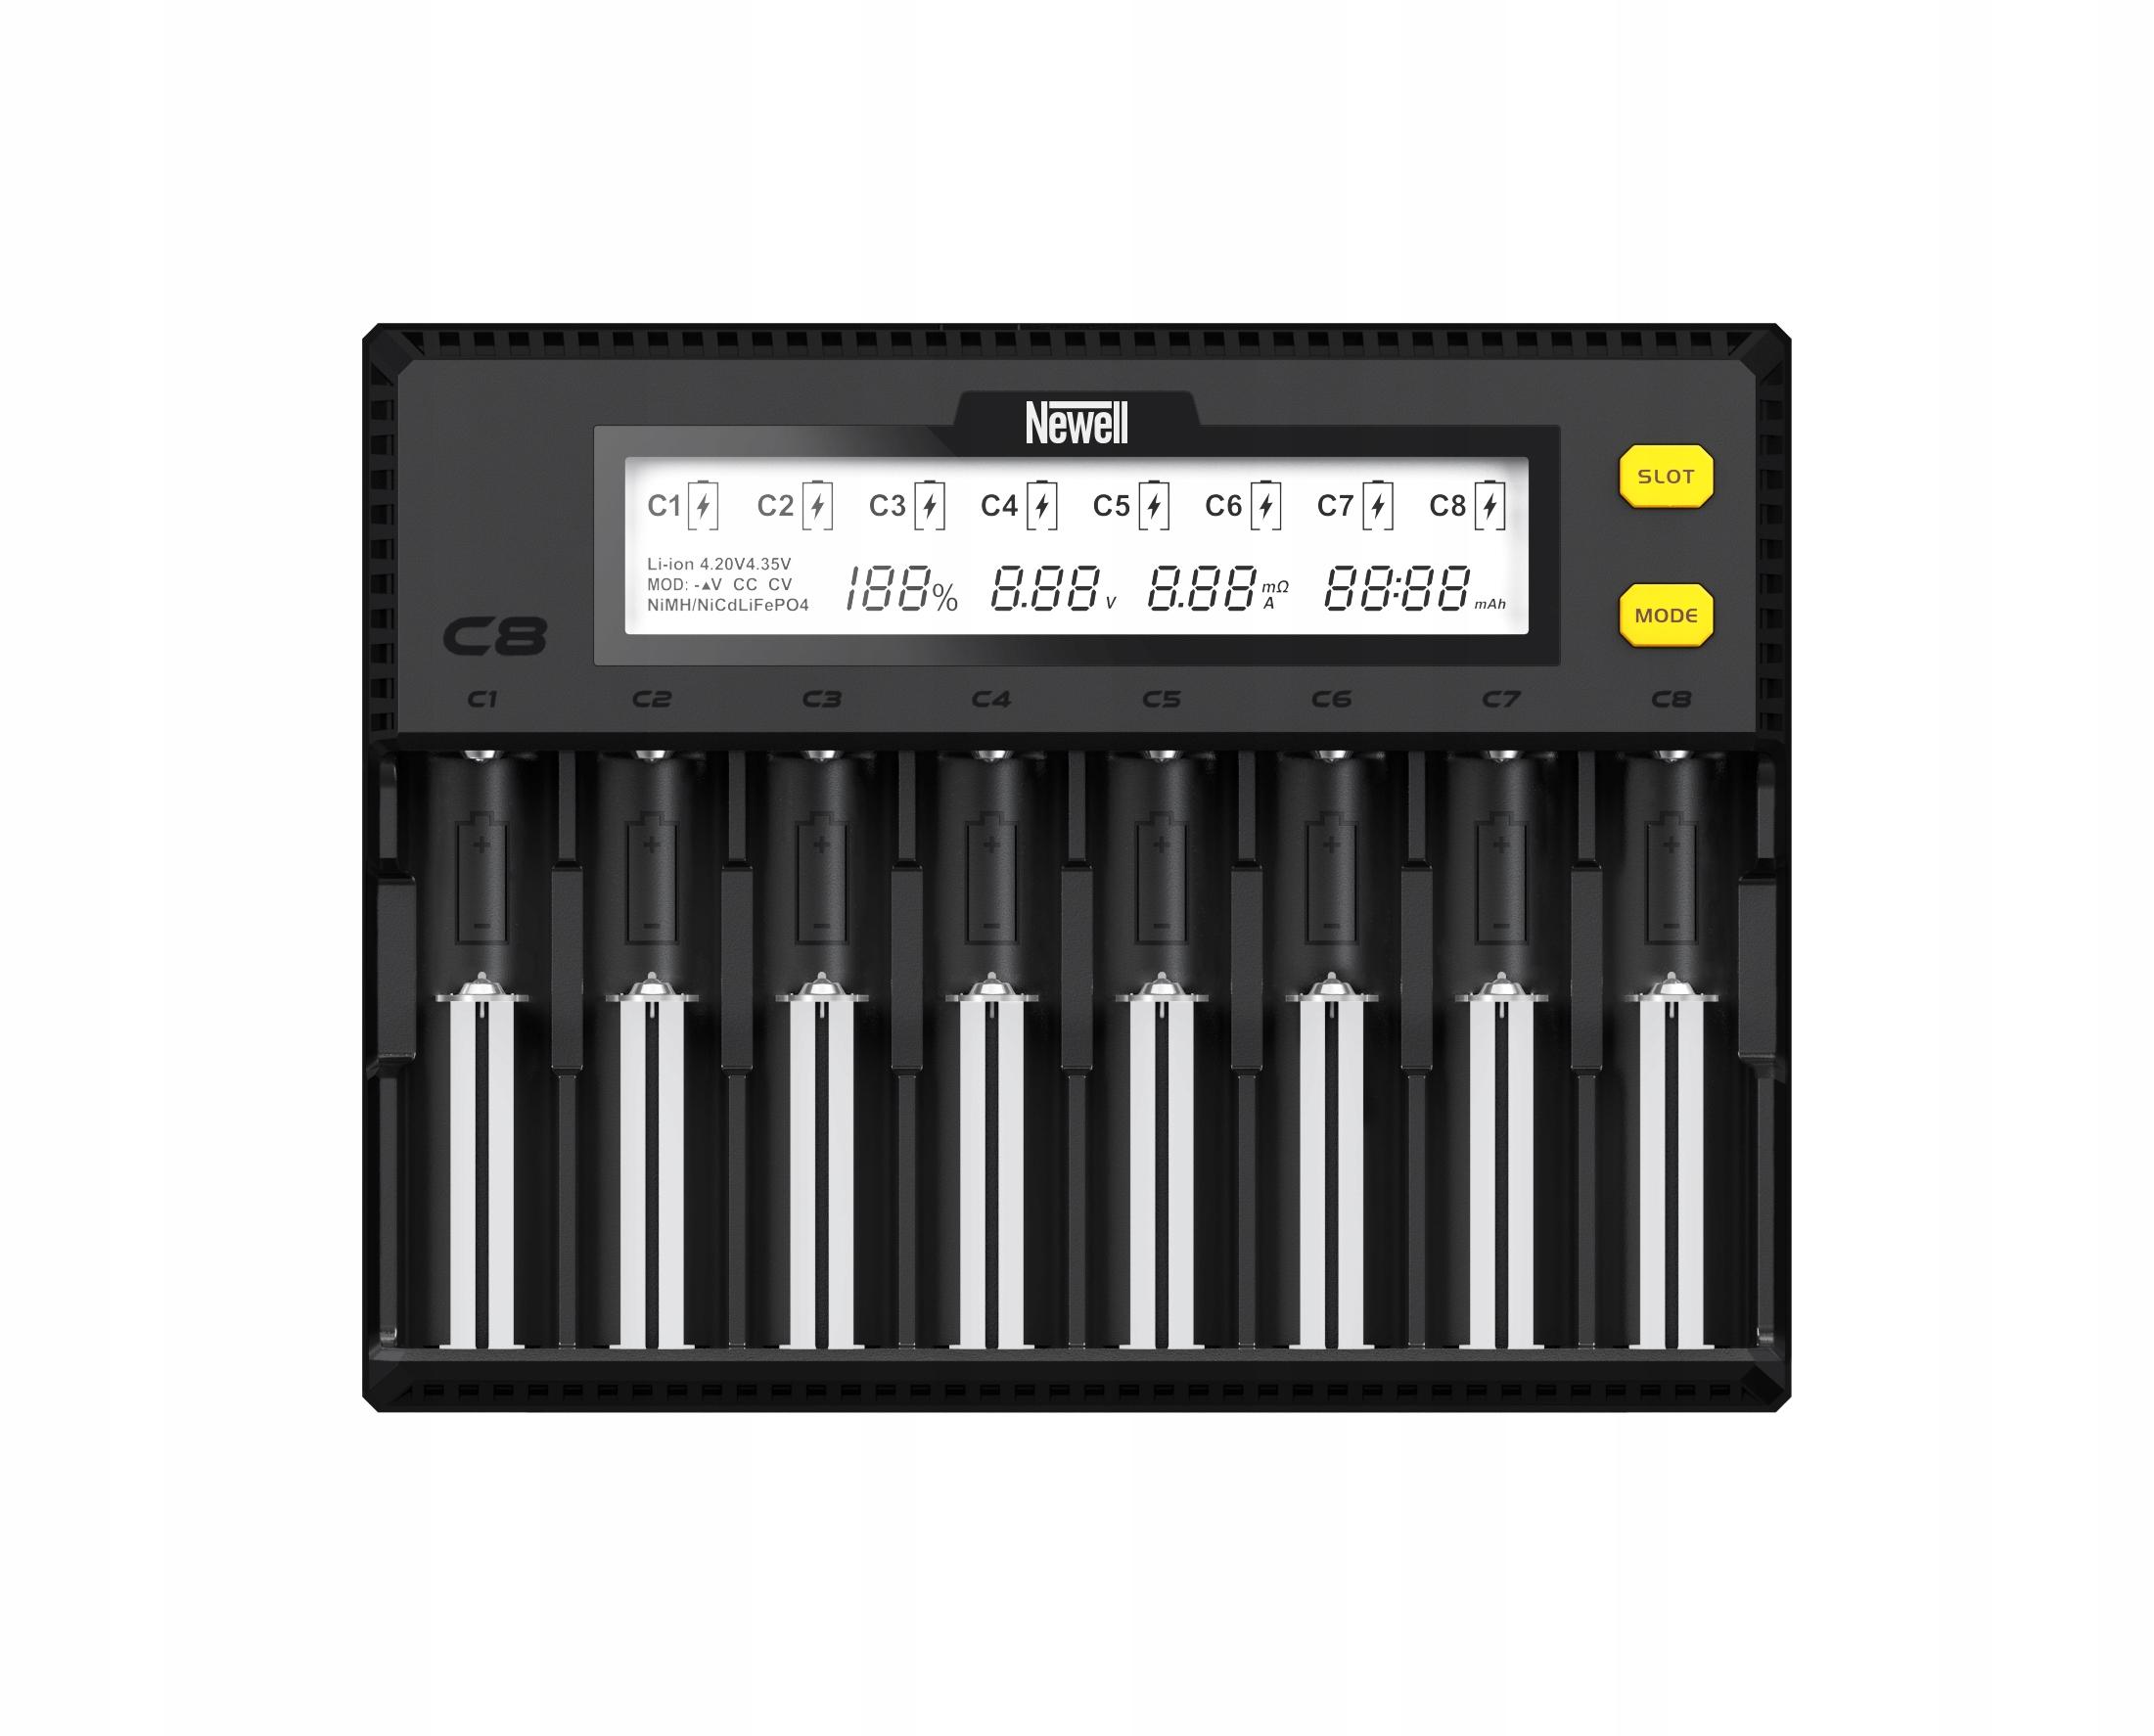 Nabíjačka Newell C8 nabíjateľné batérie NiMH/Li-Ion batérie typu AA